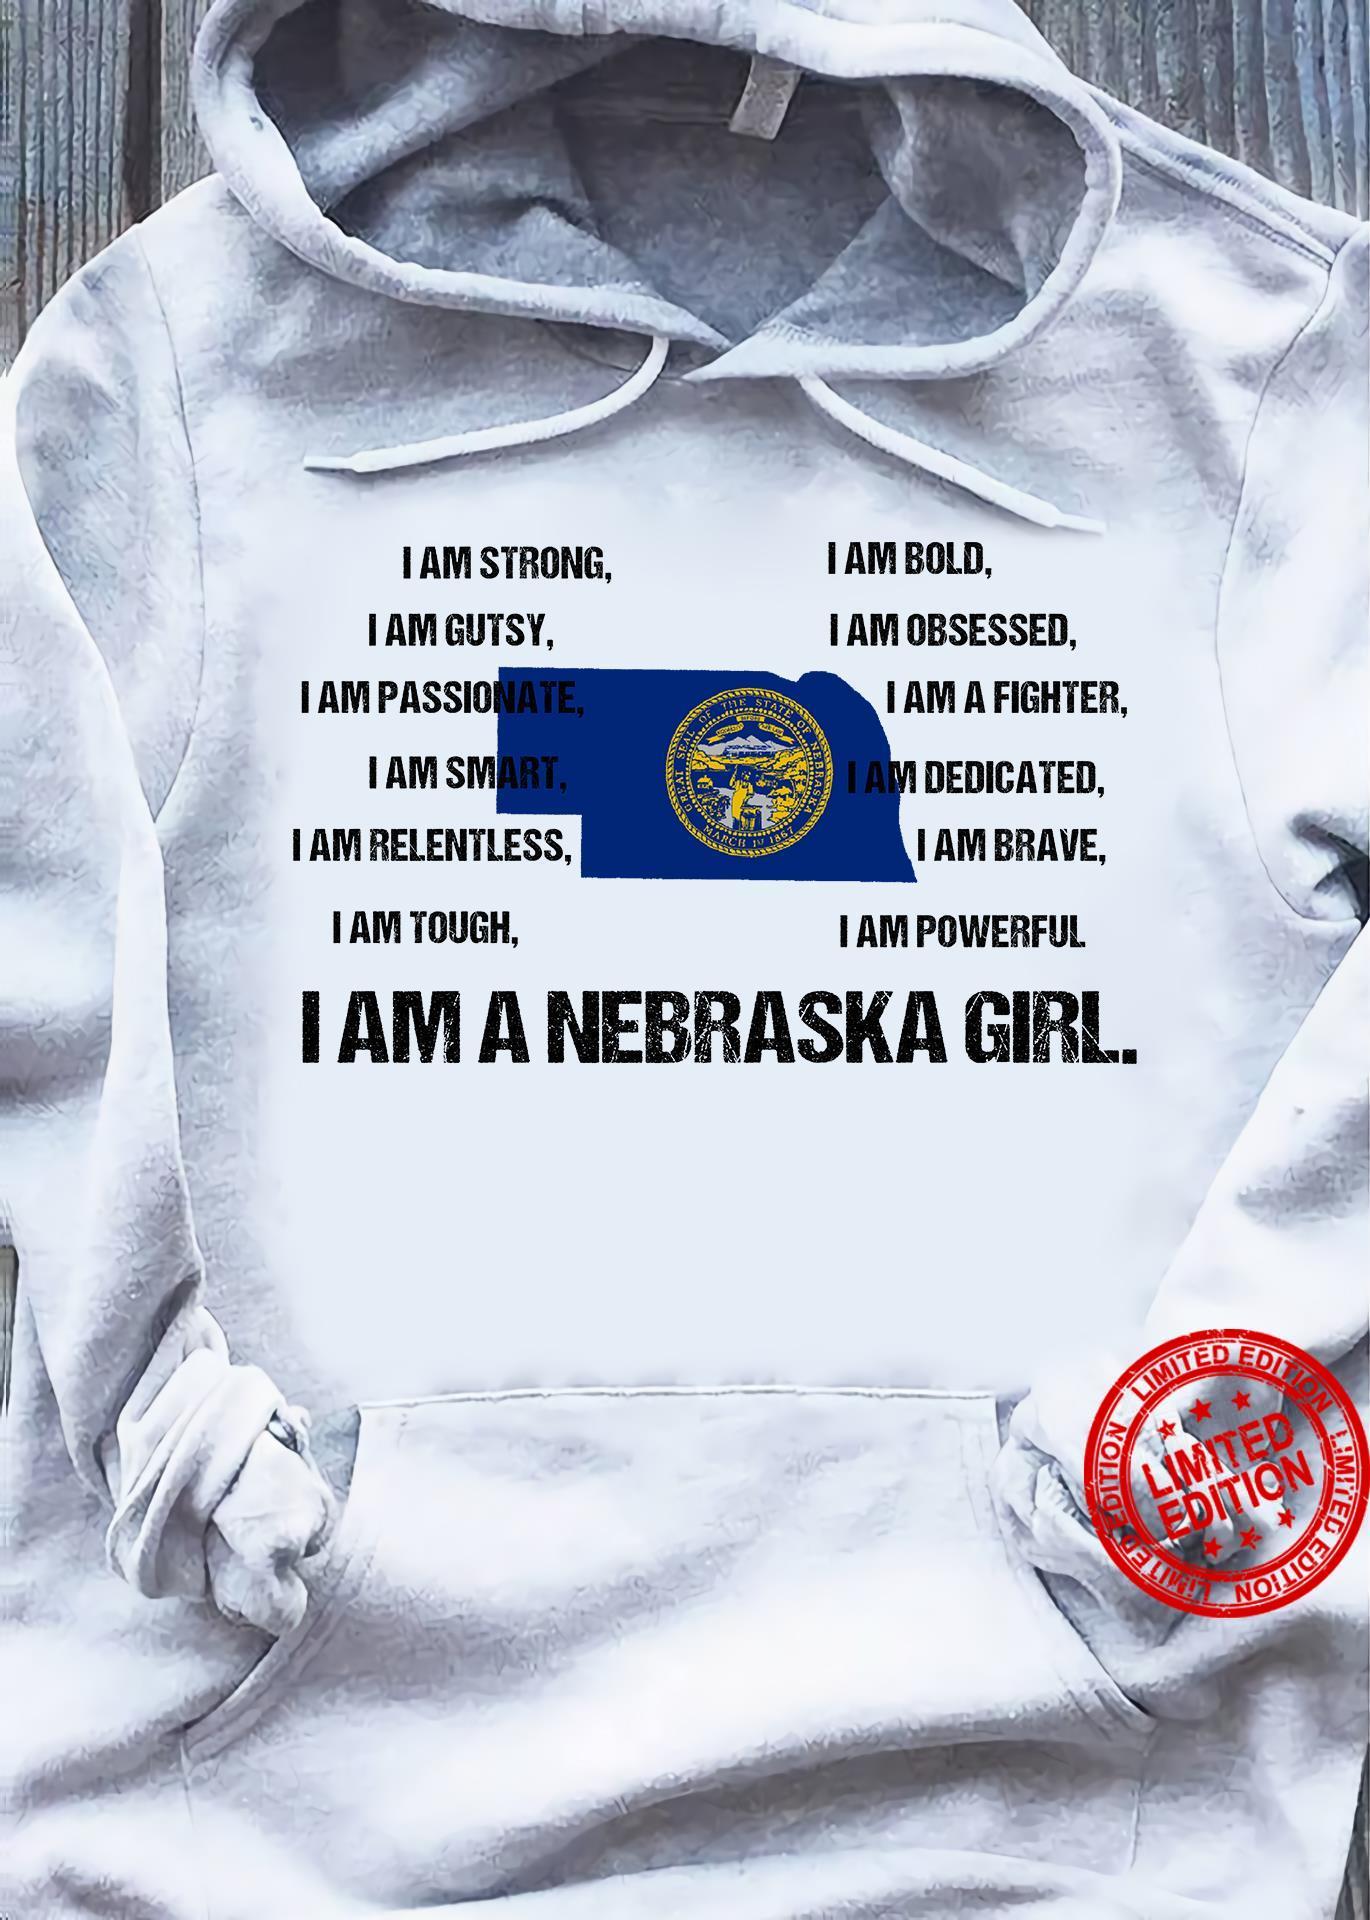 I Am Strong I Am Gutsy I Am Passionate I Am Smart I Am Relentless I Am Tough I Am Bold I Am A Fighter I Am Dedicated I Am Brave I Am Powerful I Am A Nebraska Girl Shirt